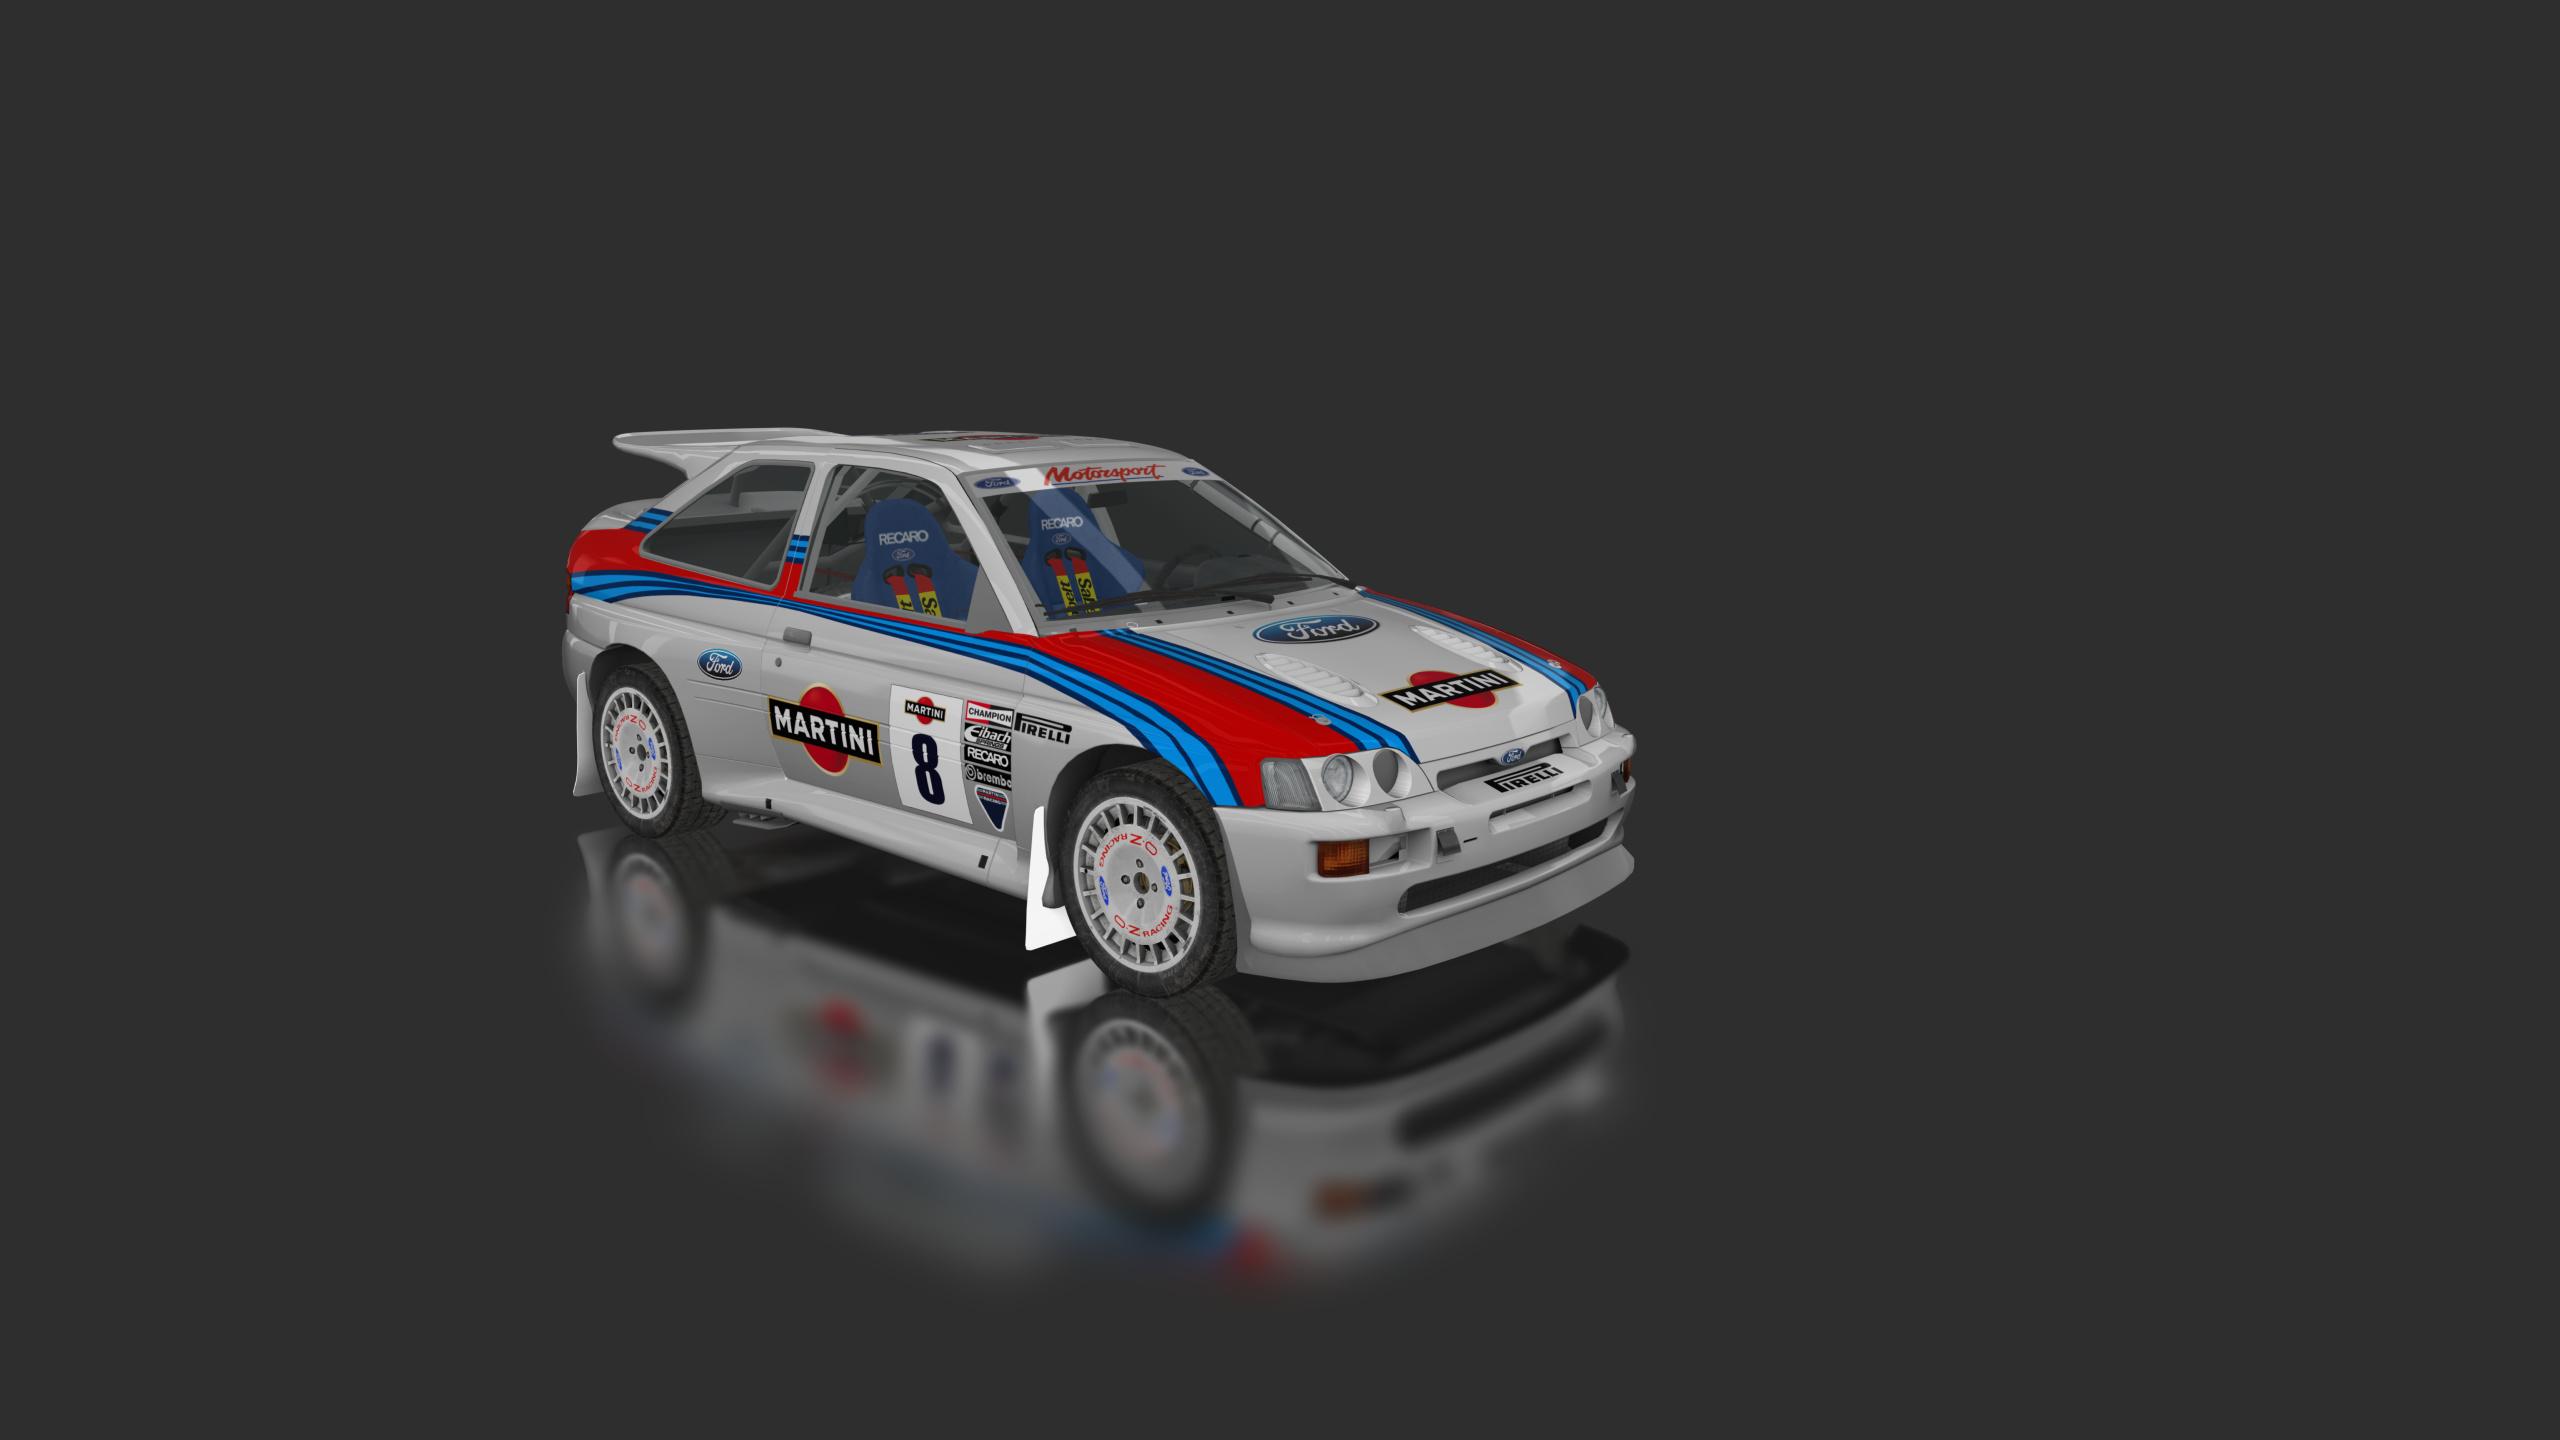 Martini Escort (4).jpg